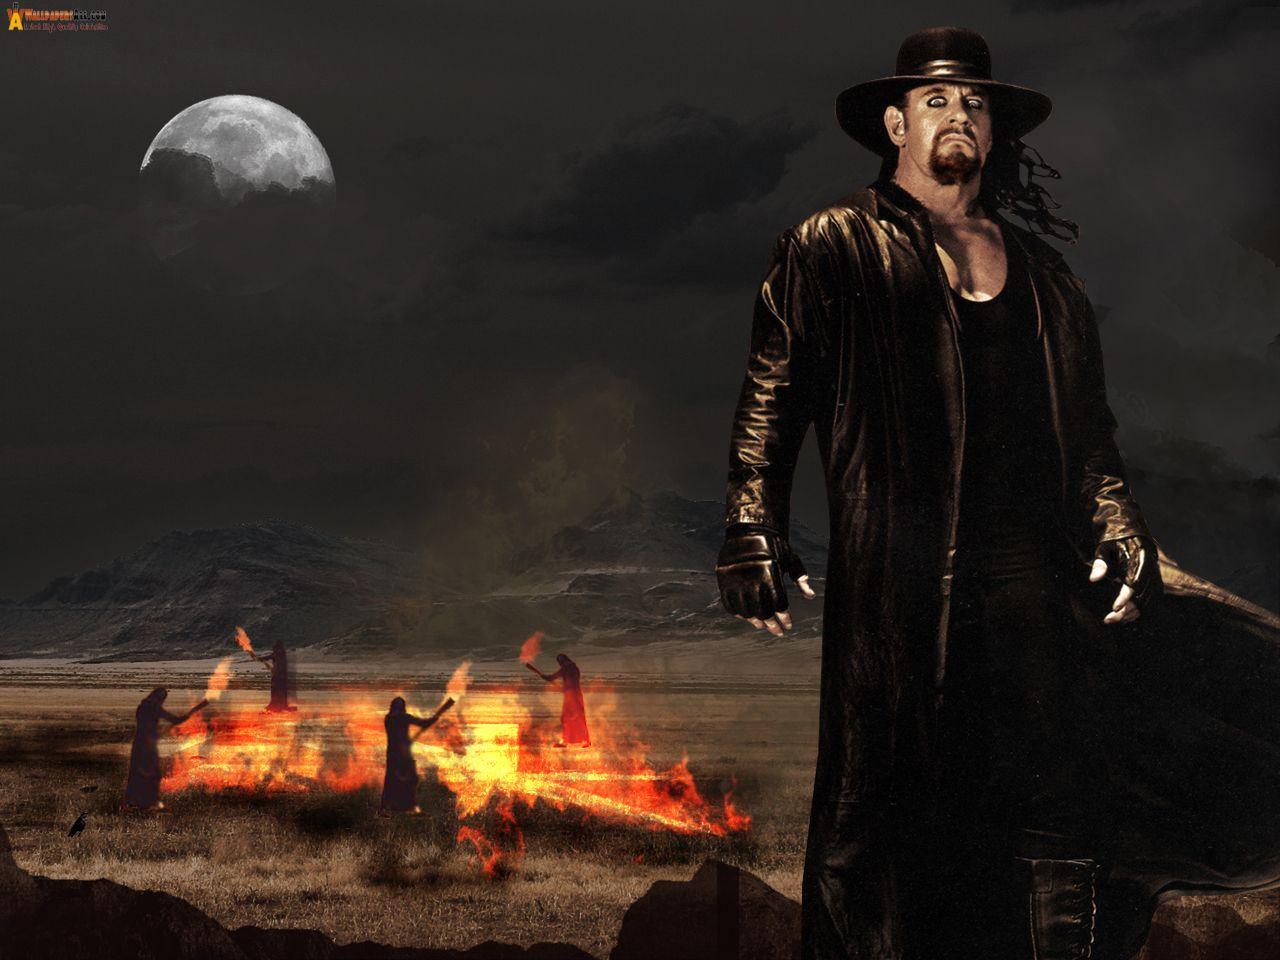 Wonderful Wallpapers: The Undertaker HD Wallpapers 2013-2014